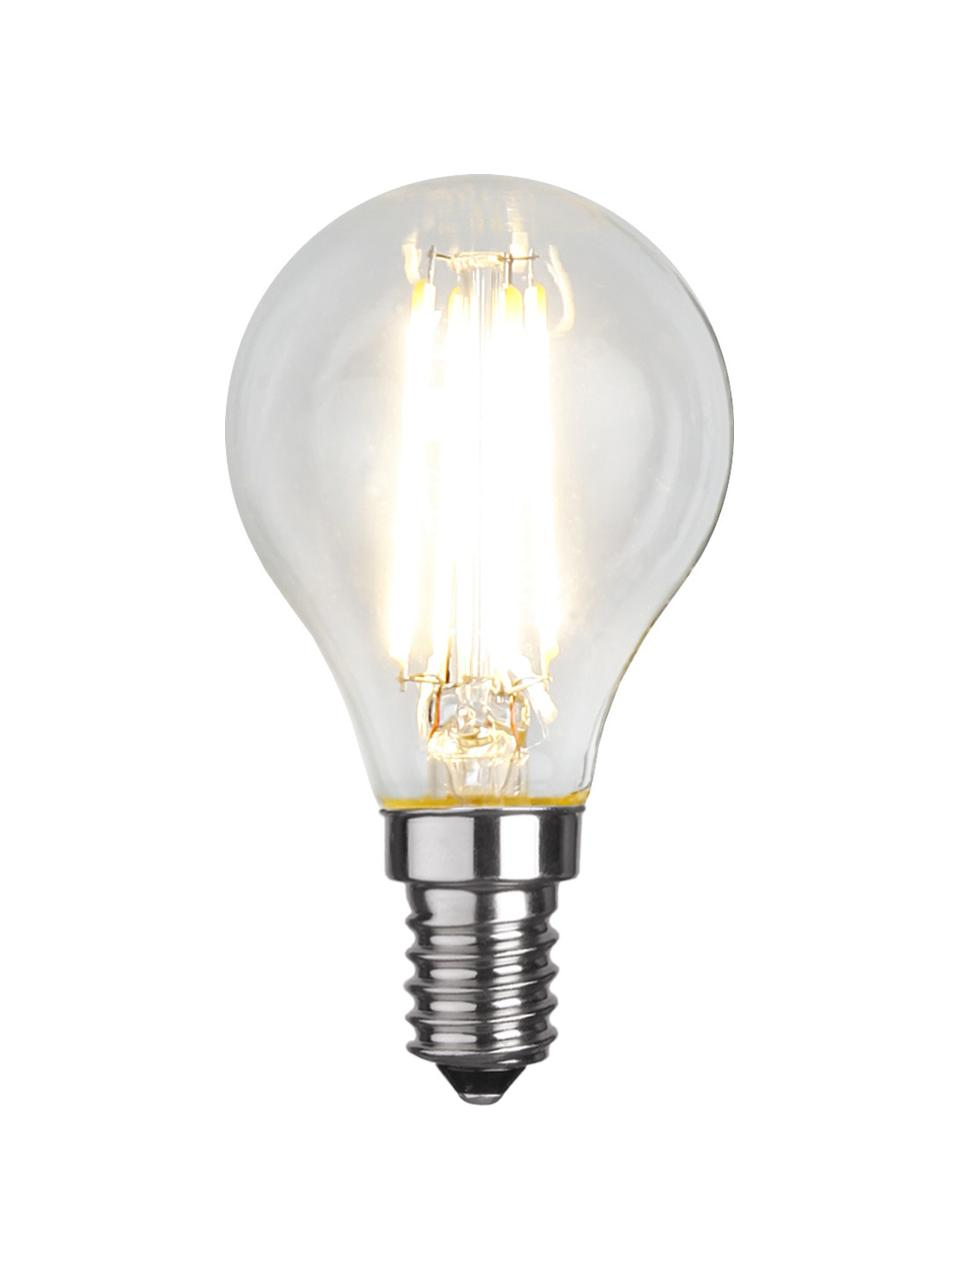 Lampadina E14, 4W, bianco caldo 6 pz, Lampadina: vetro, Trasparente, Ø 5 x Alt. 8 cm